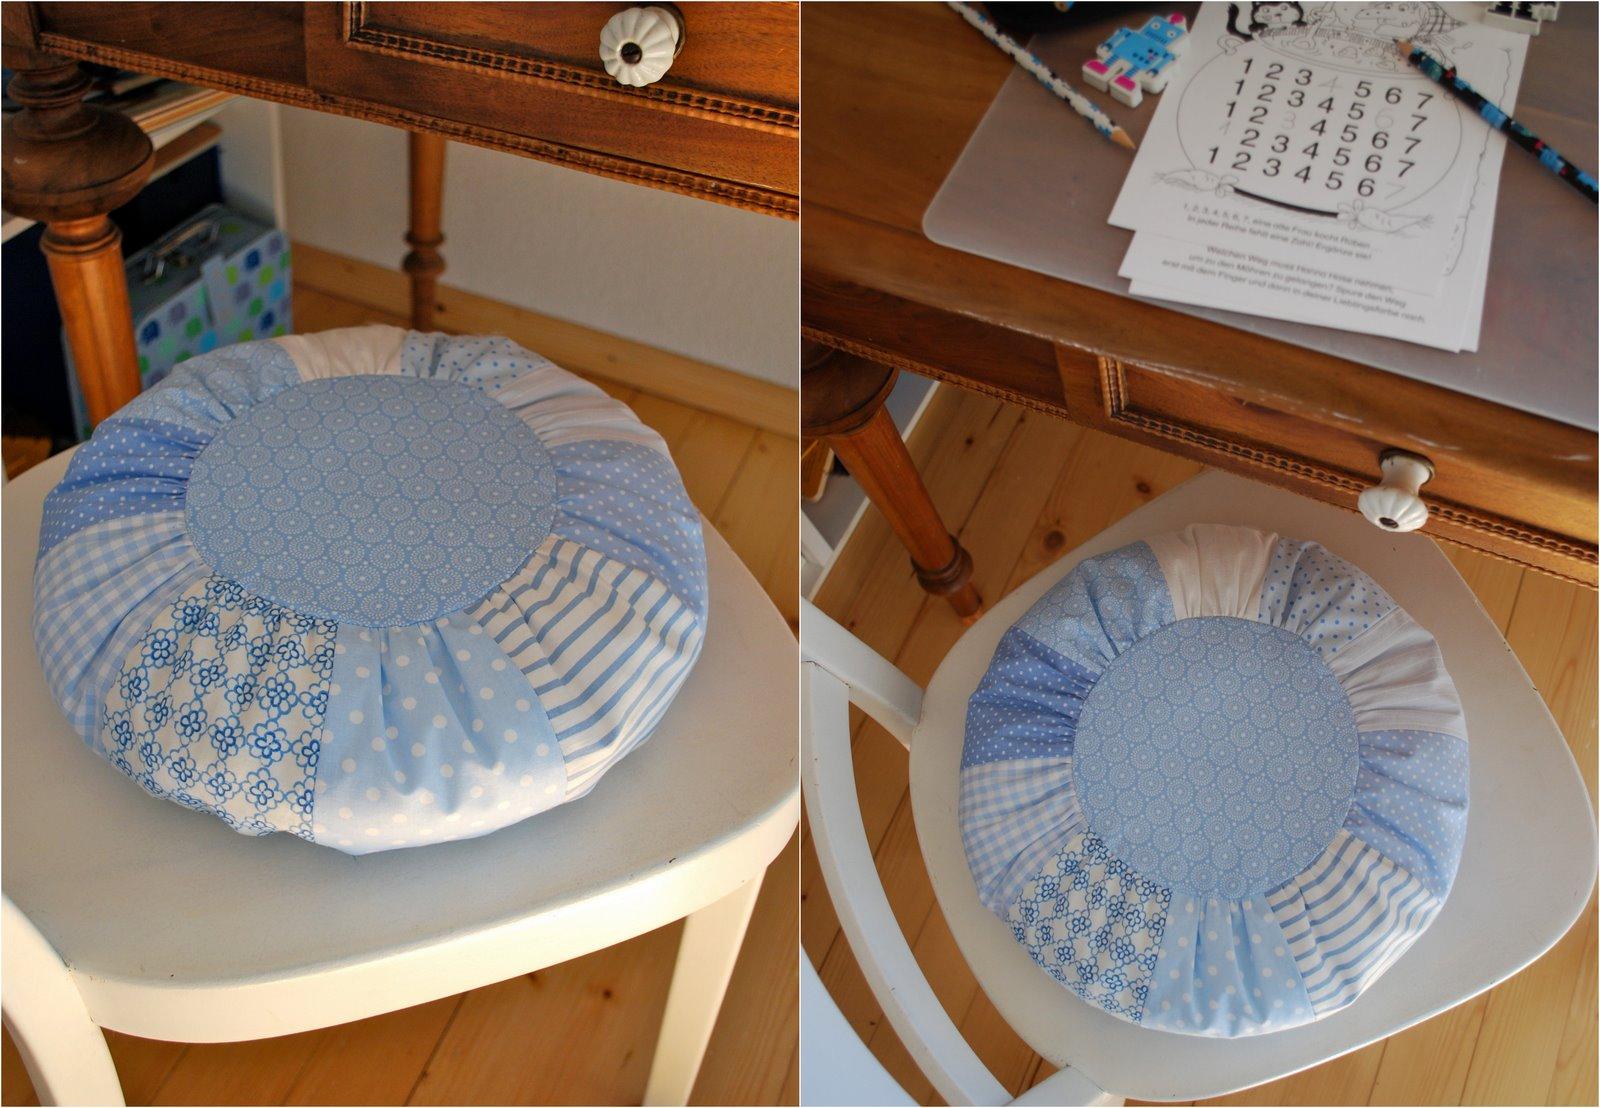 mamas kram love pillow. Black Bedroom Furniture Sets. Home Design Ideas